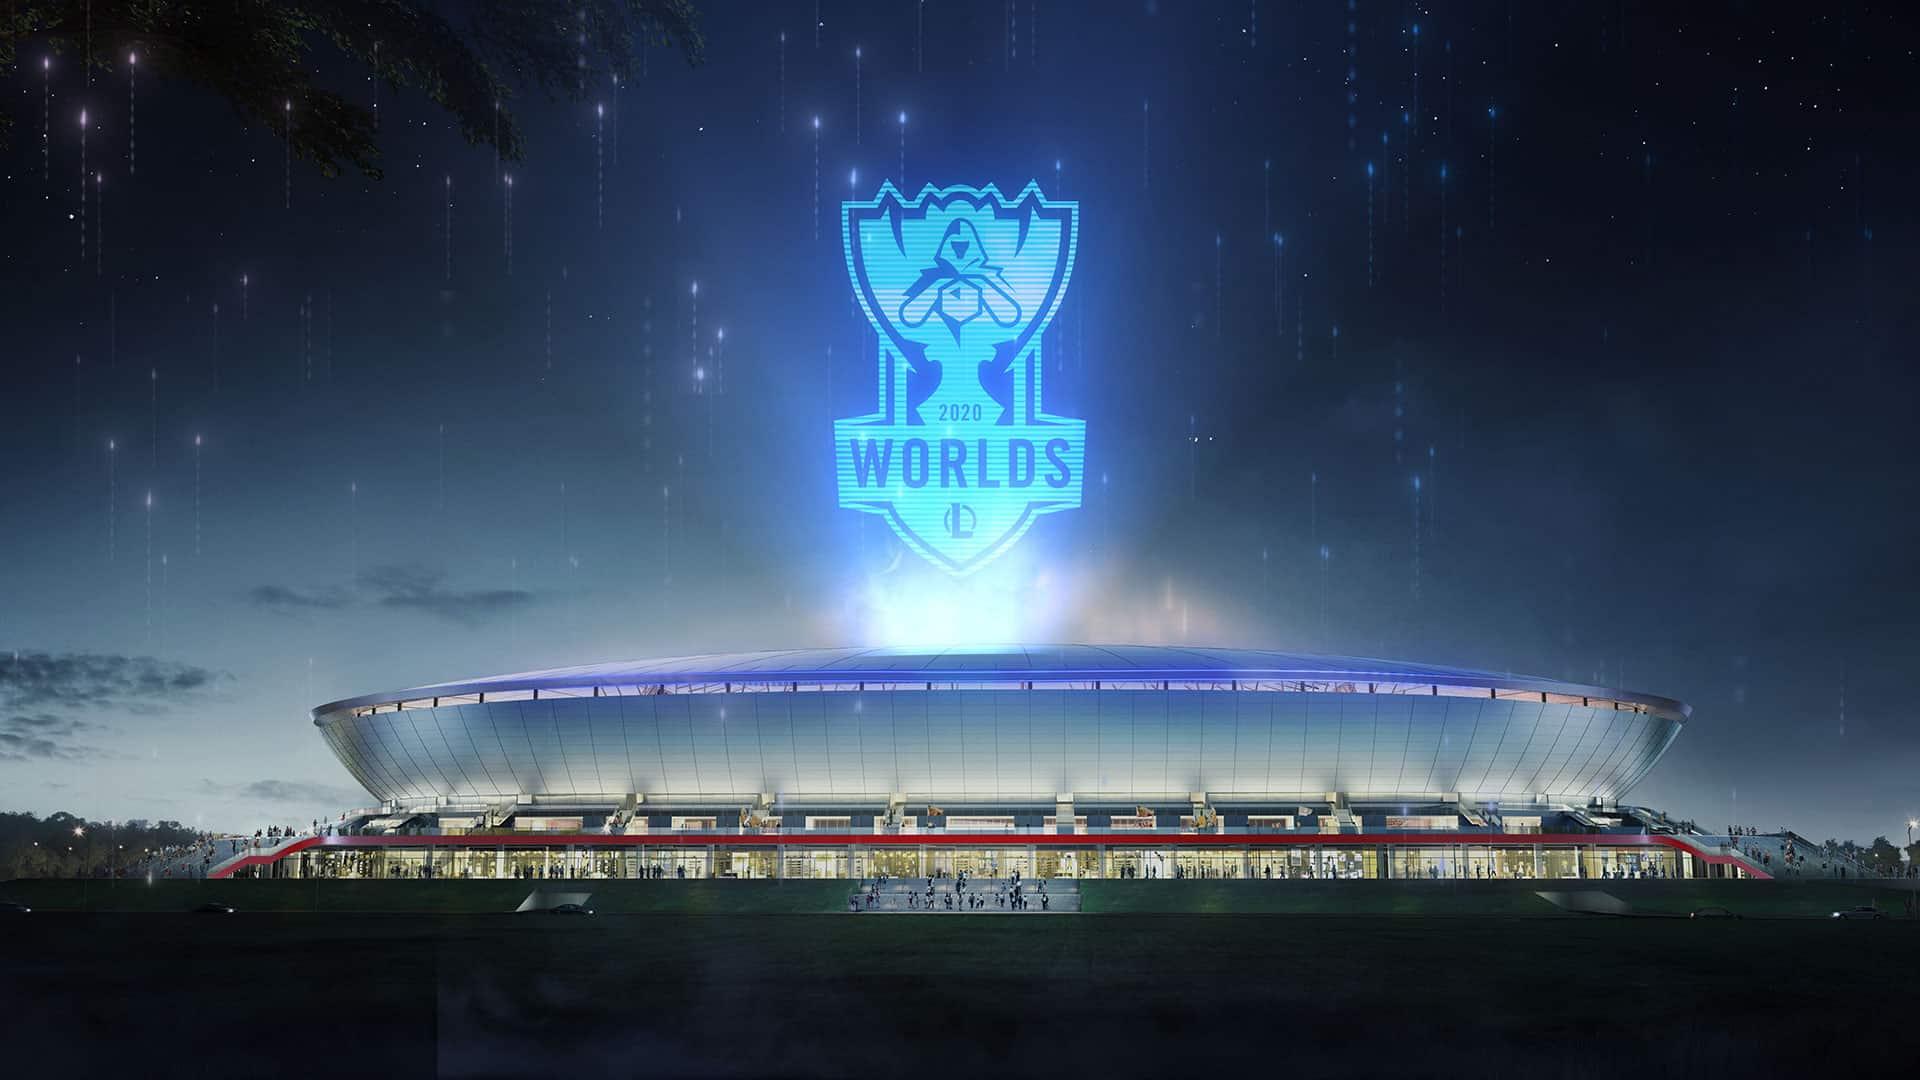 Copy of Pudong Stadium babt